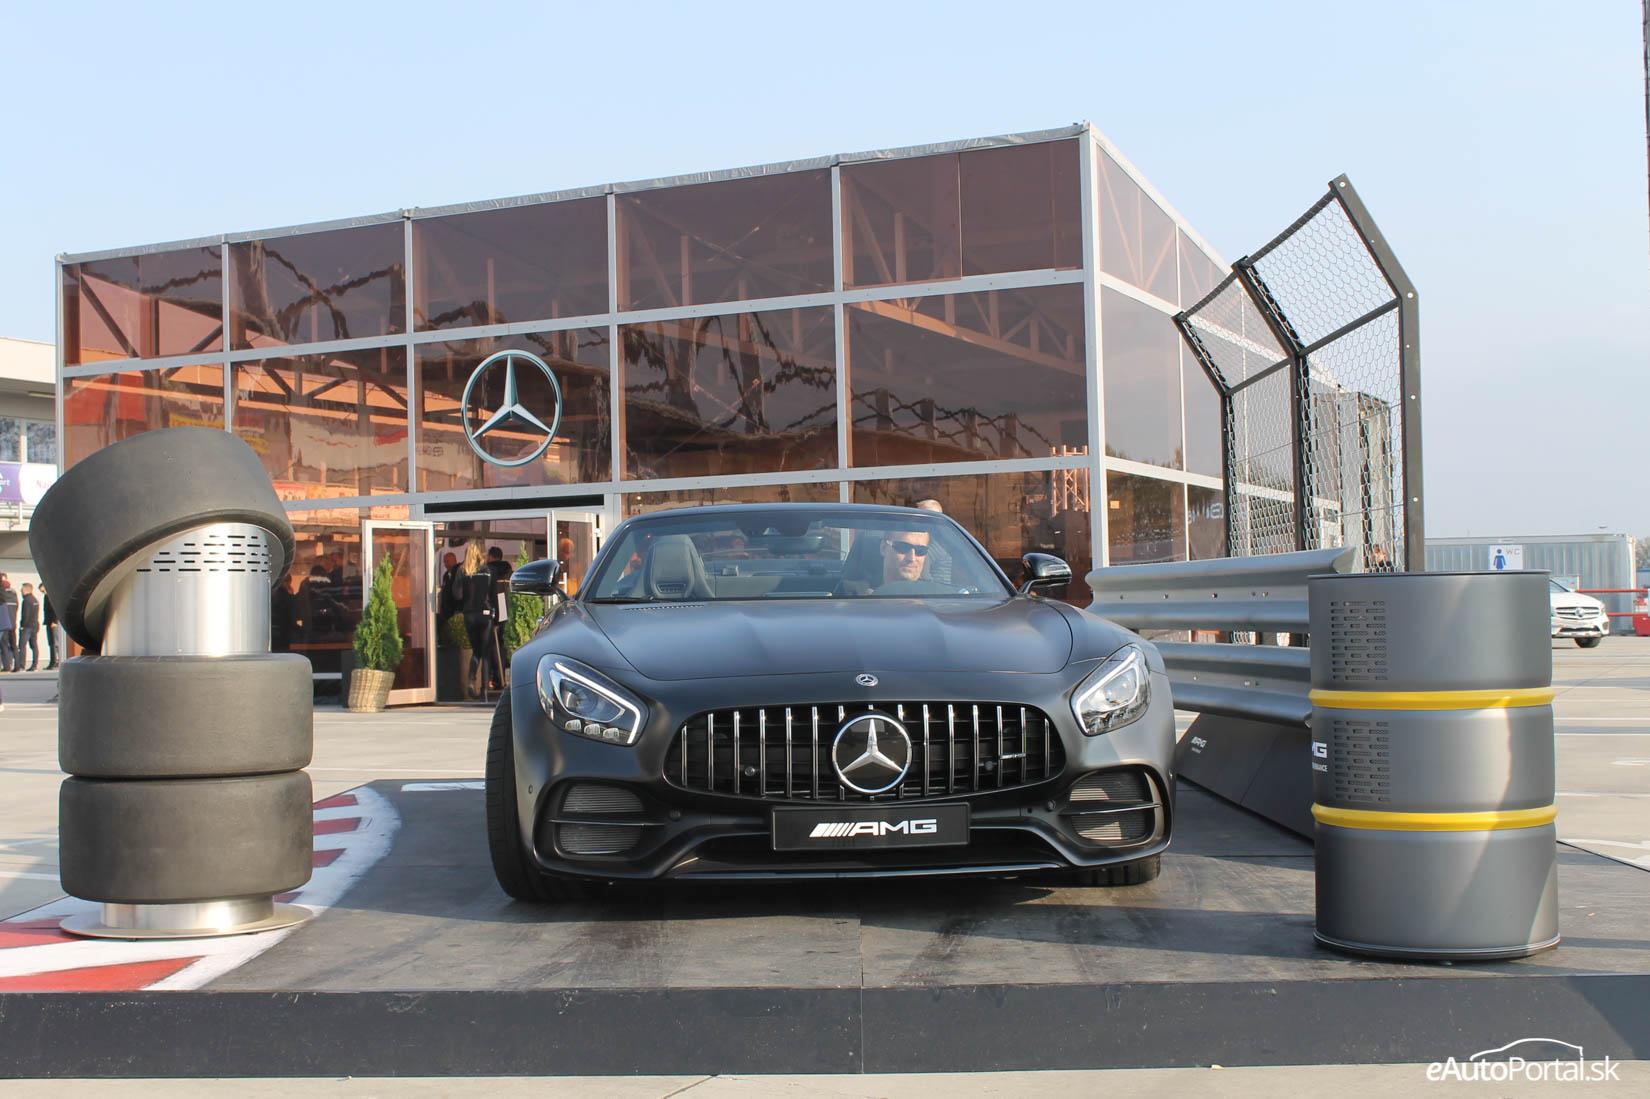 mercedes-benz star experience roadshow 2017